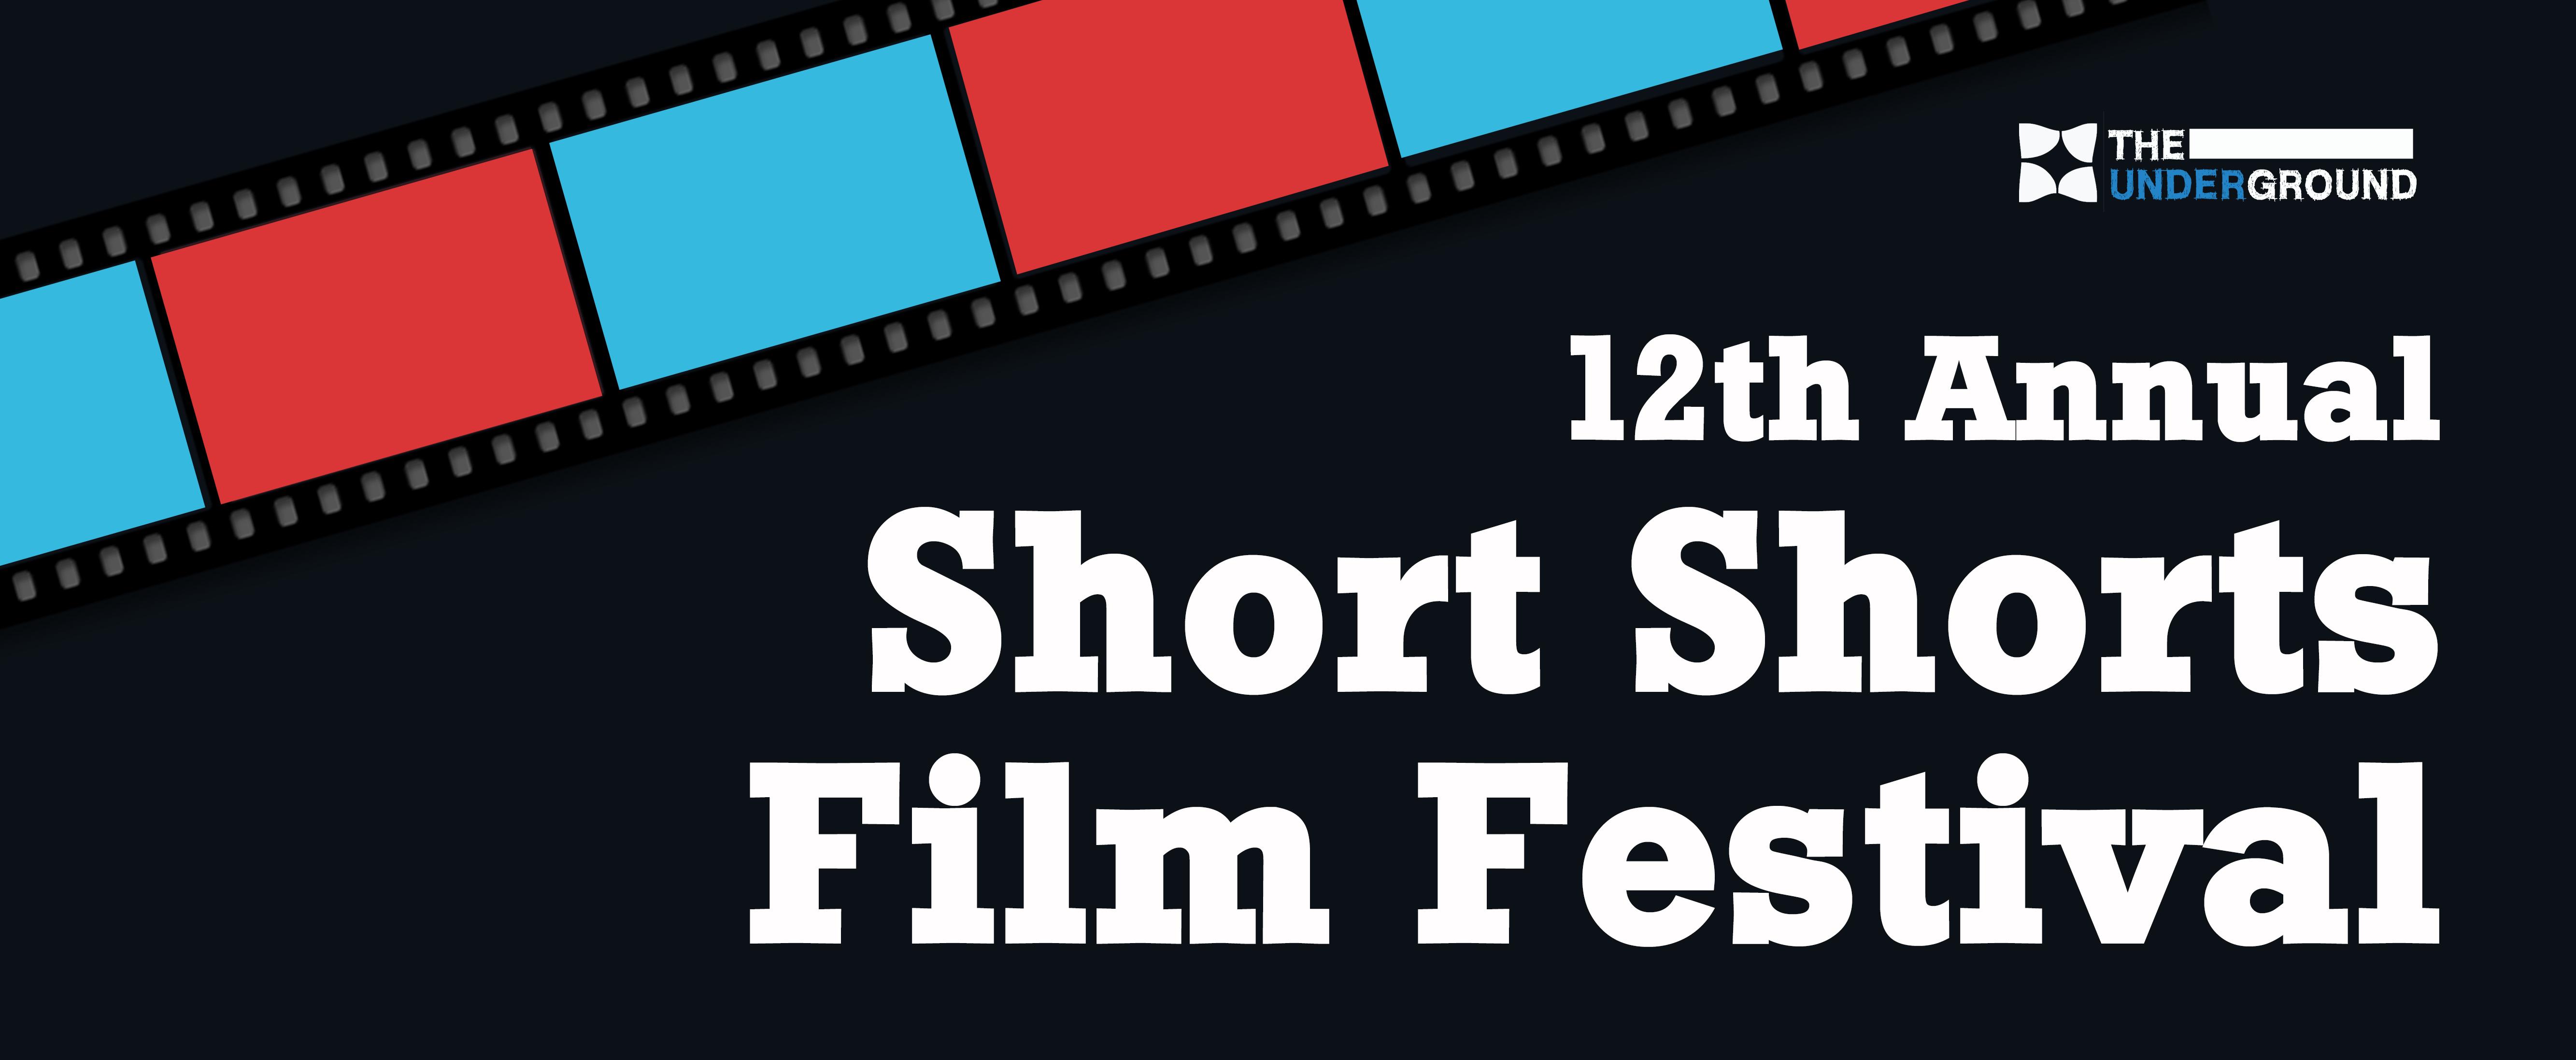 Short Shorts Film Festival 2017